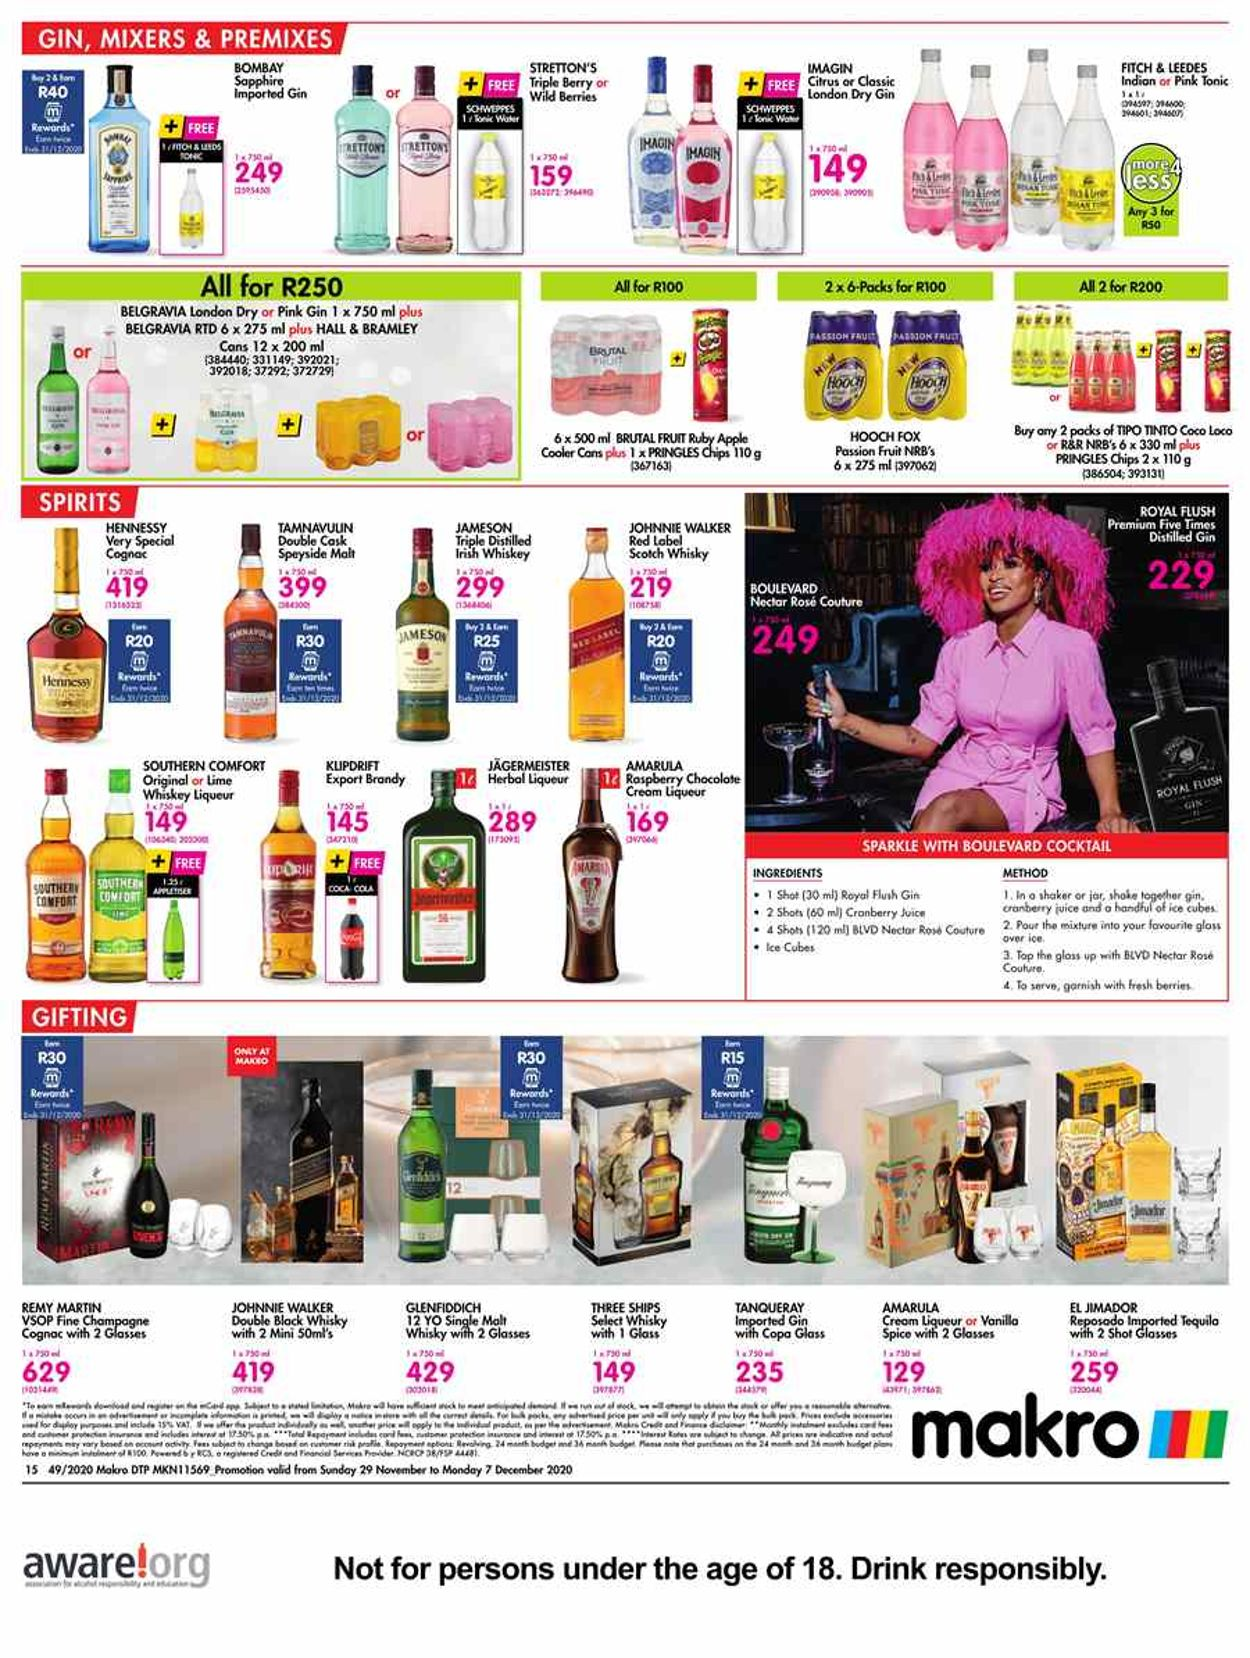 Makro Xmas 2020 Catalogue - 2020/11/29-2020/12/07 (Page 15)